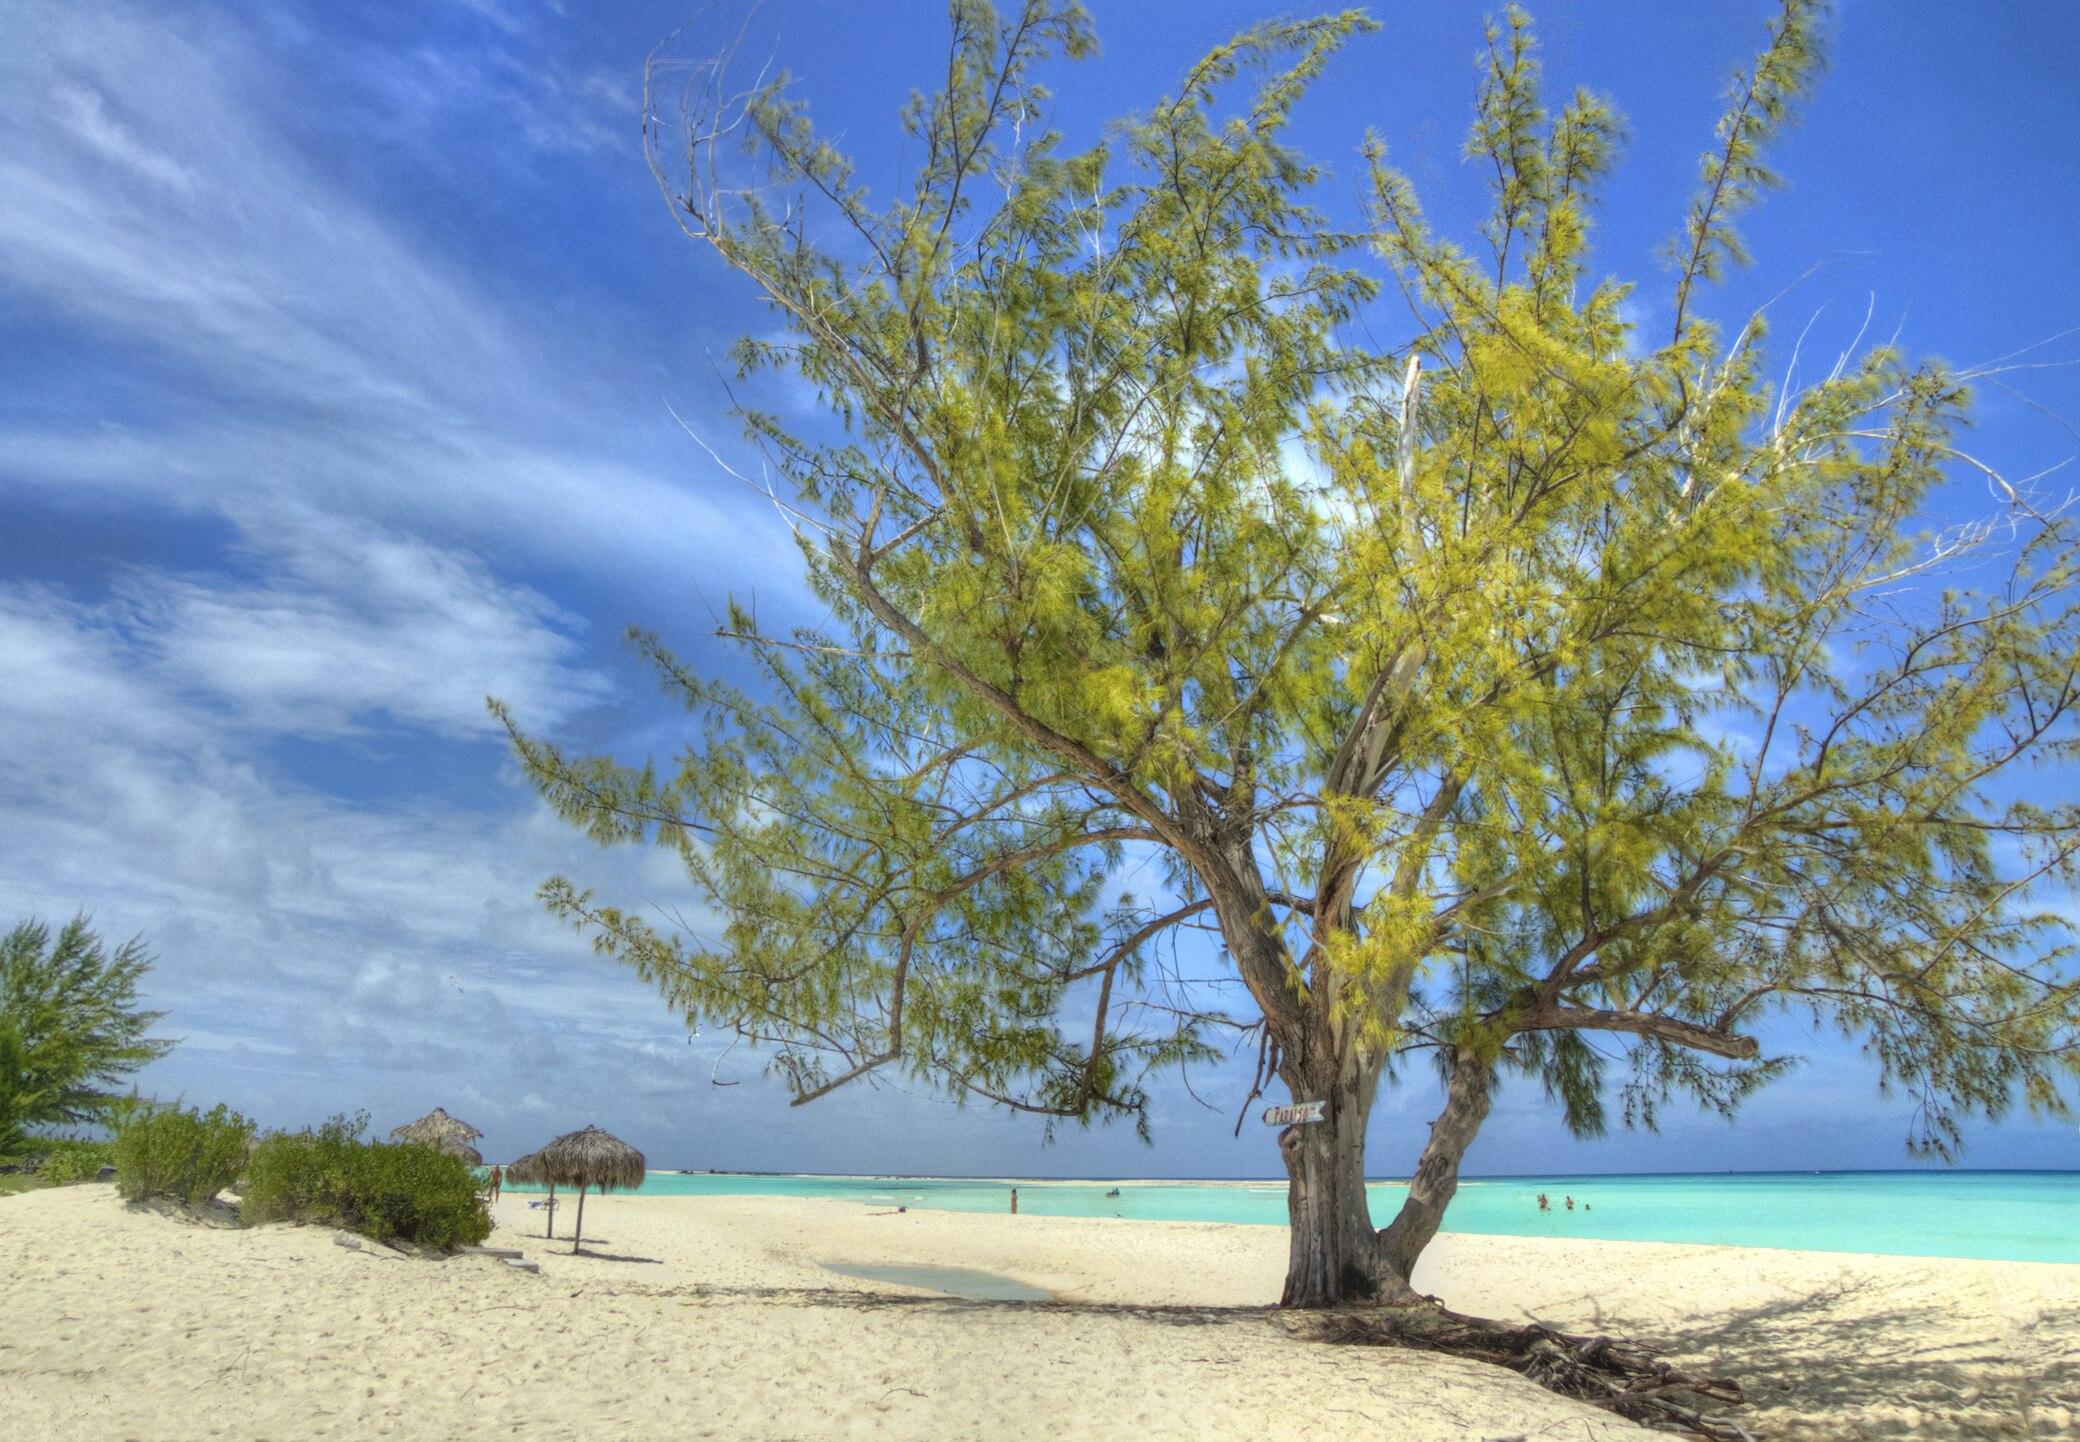 Paraiso beach,, Kuba